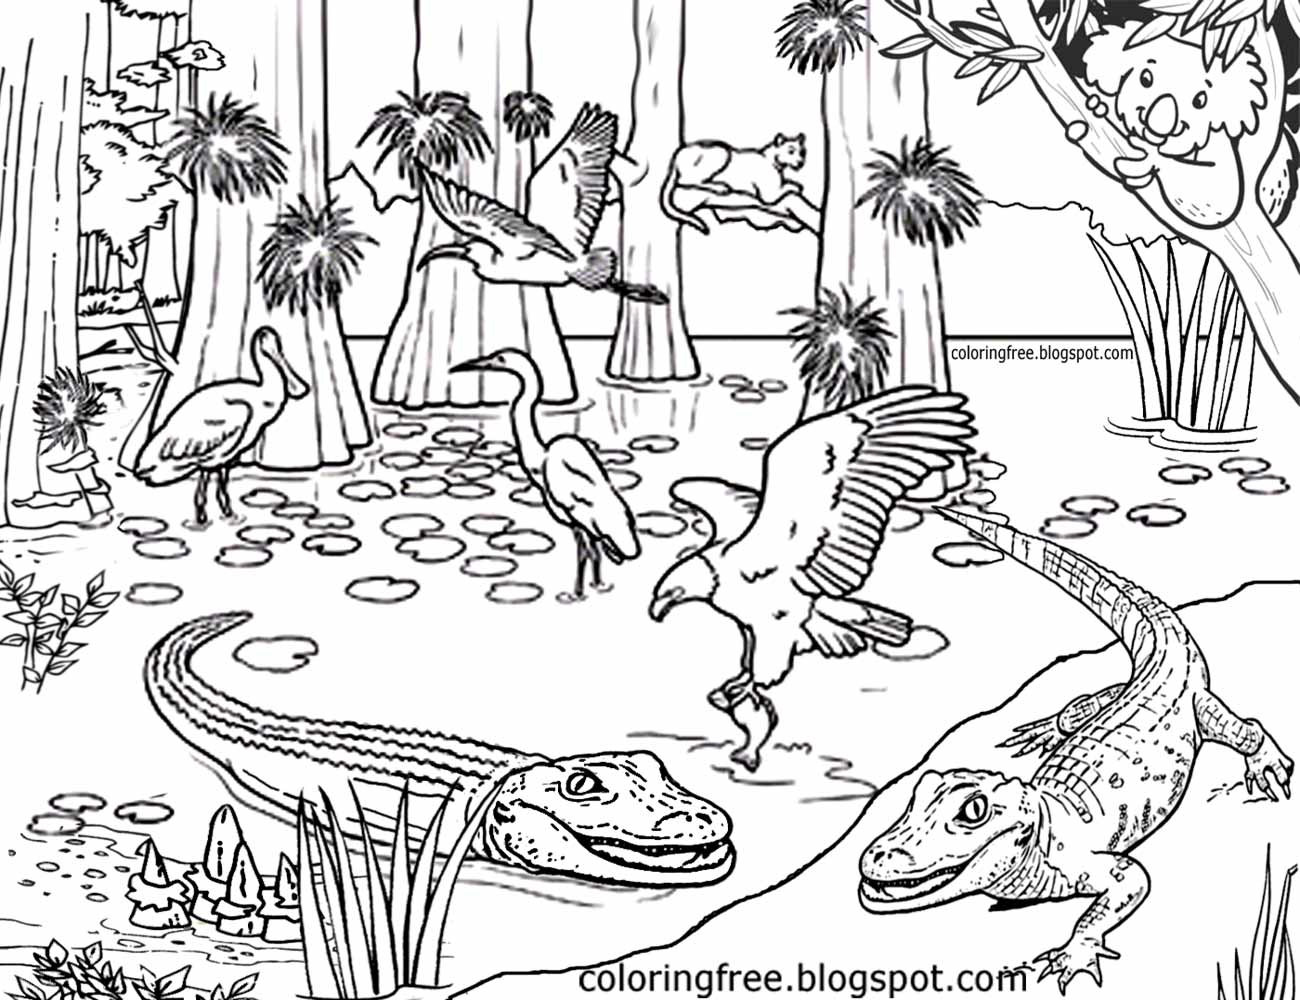 1300x1000 Australia Coloring Pages Australian Animals Colouring Brisbane